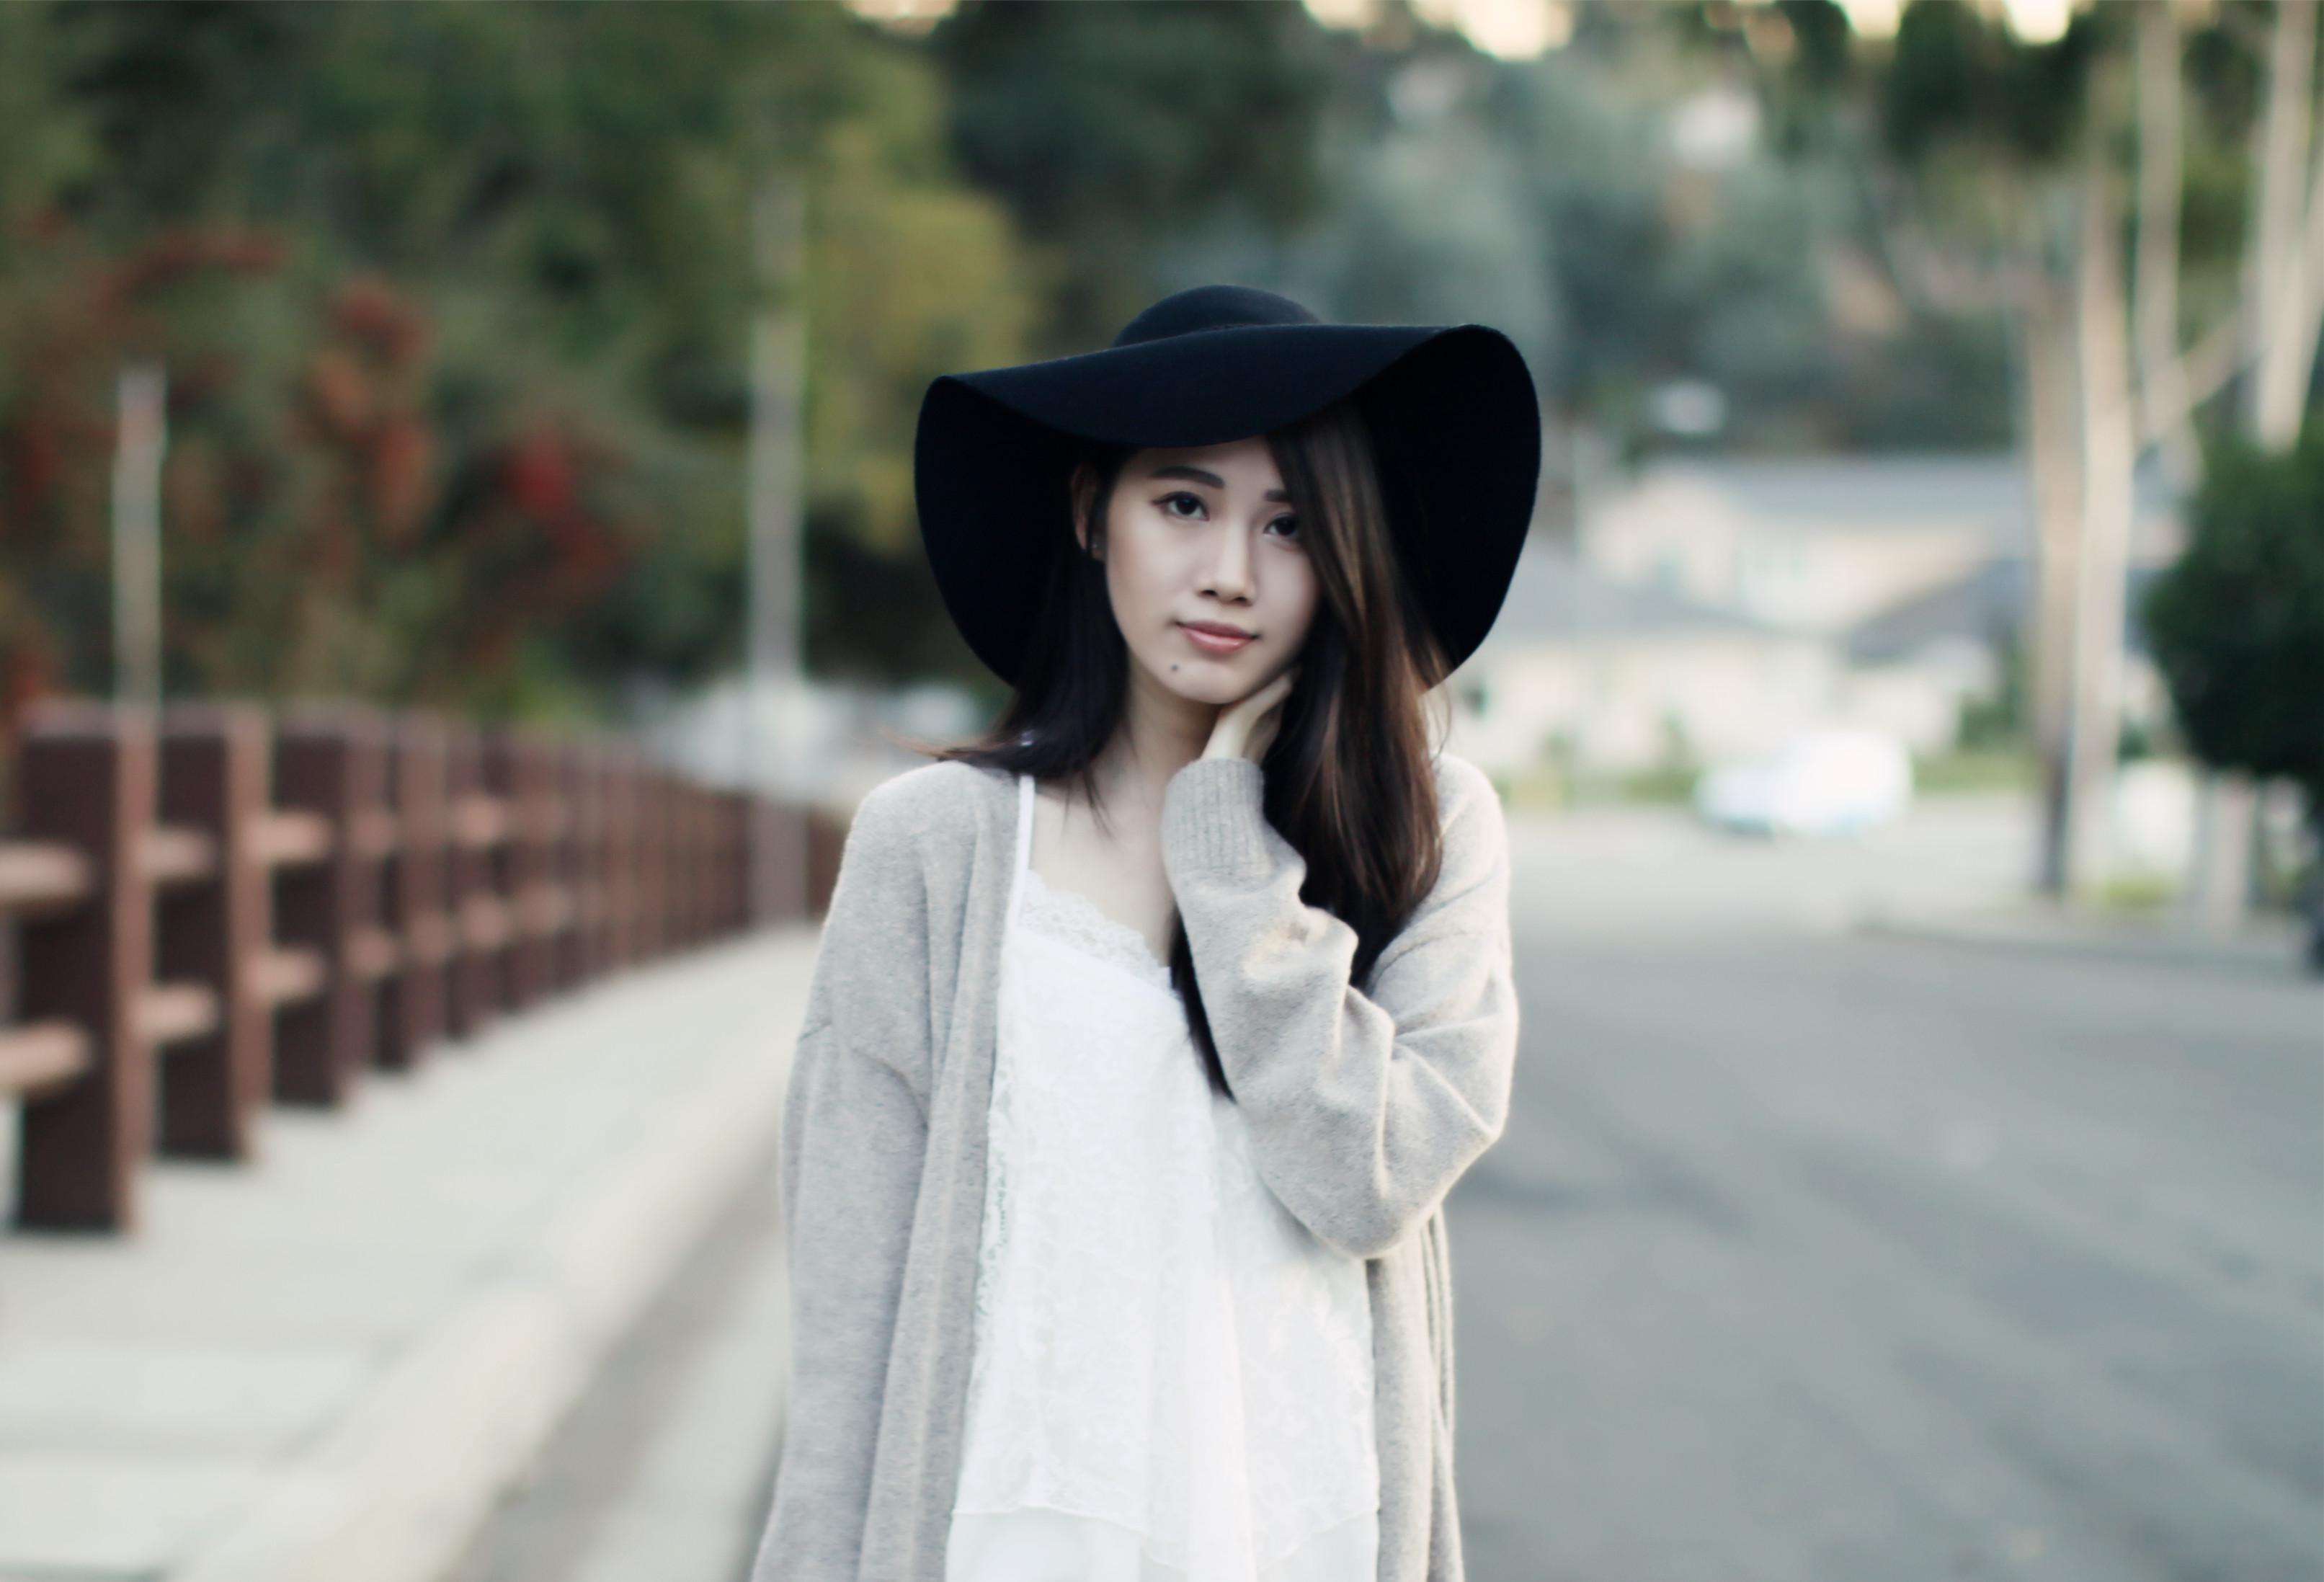 3840-ootd-fashion-style-outfitoftheday-wiwt-nordstrom-abercrombie-bohemian-fallfashion-forever21-f21-f21xme-koreanfashion-elizabeeetht-clothestoyouuu